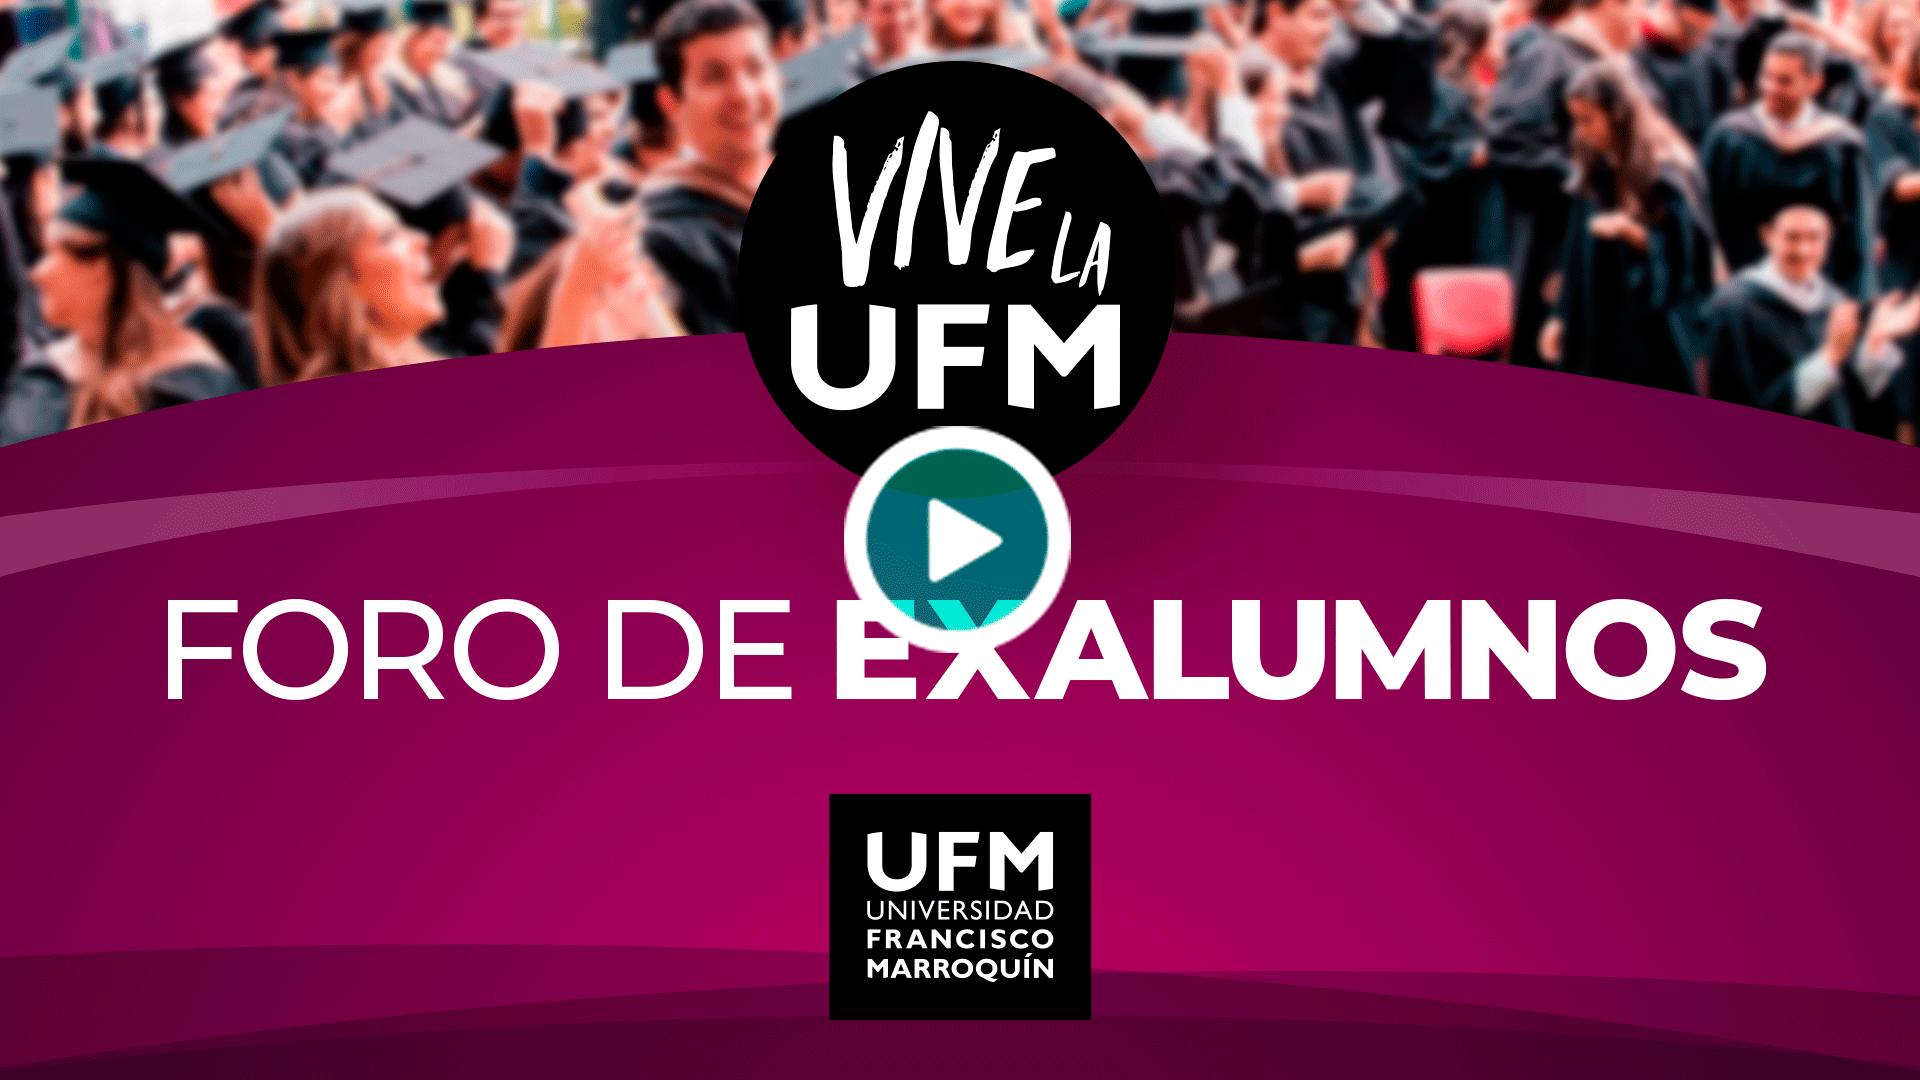 20200622_foroexalumnos1_-Exalumnos_VIVE_la_UFM_Portada